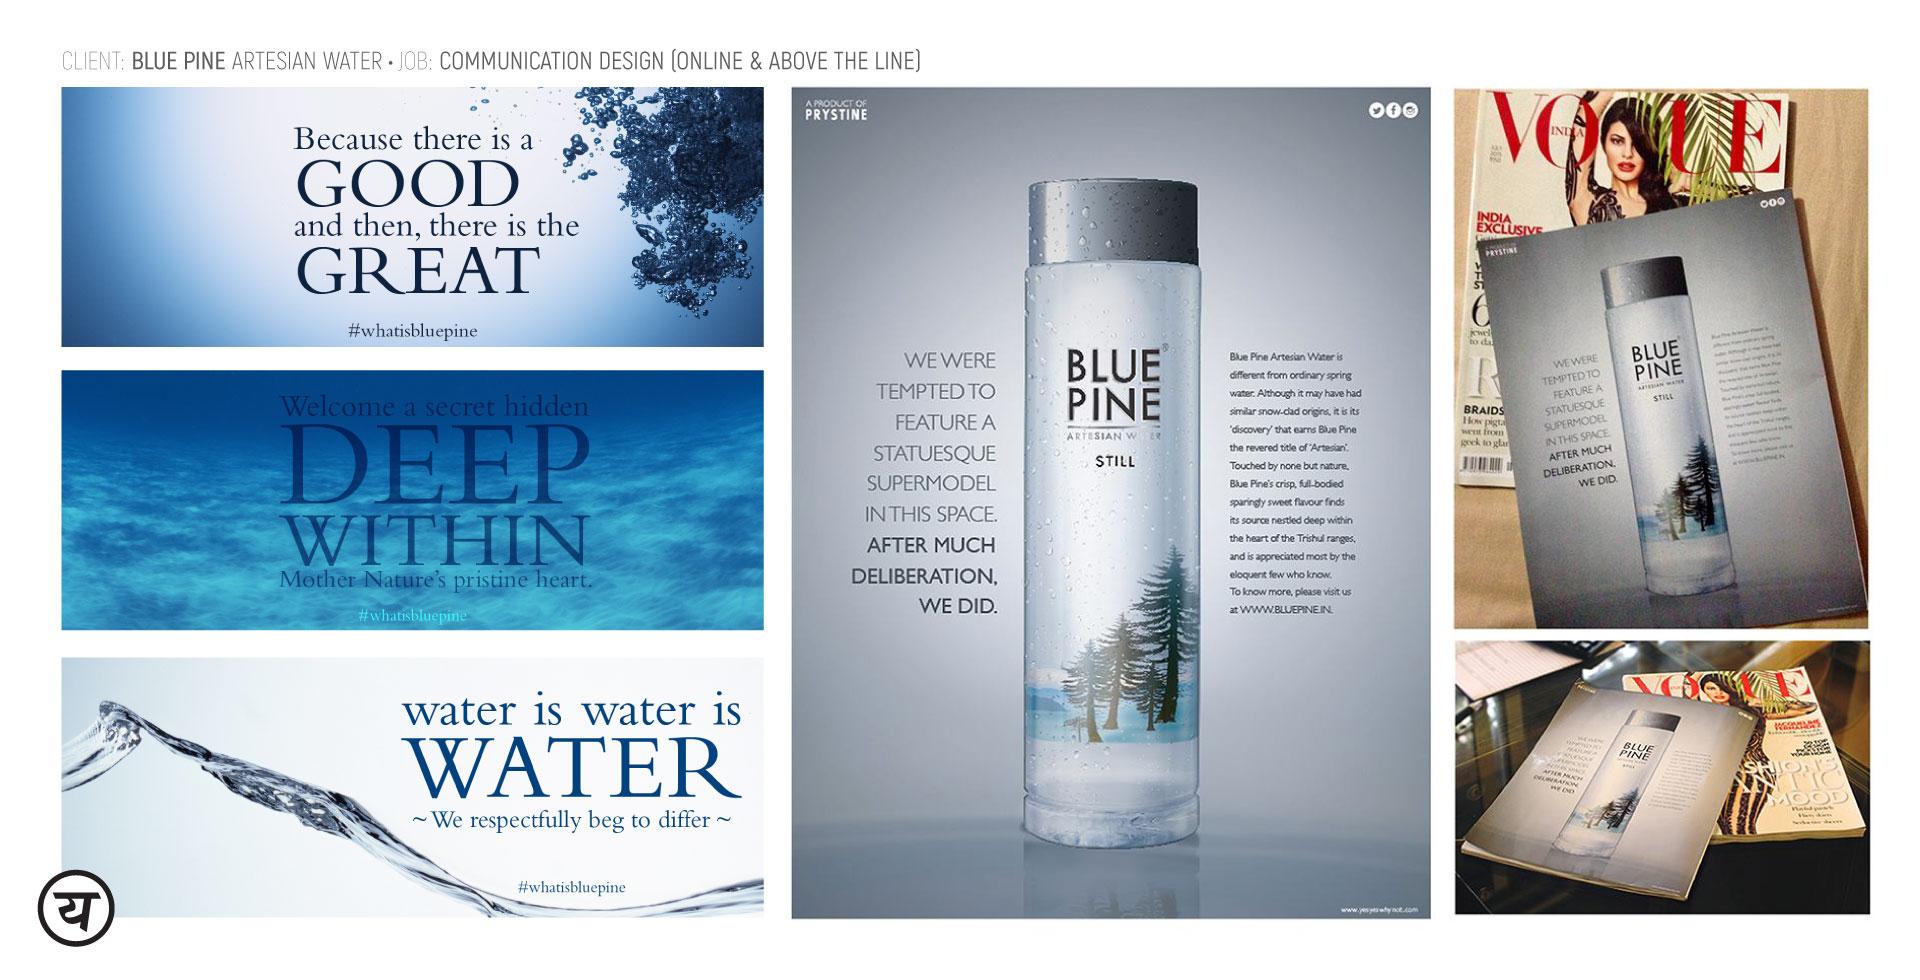 YesYesWhyNot_Communication-Design_BluePine-#3